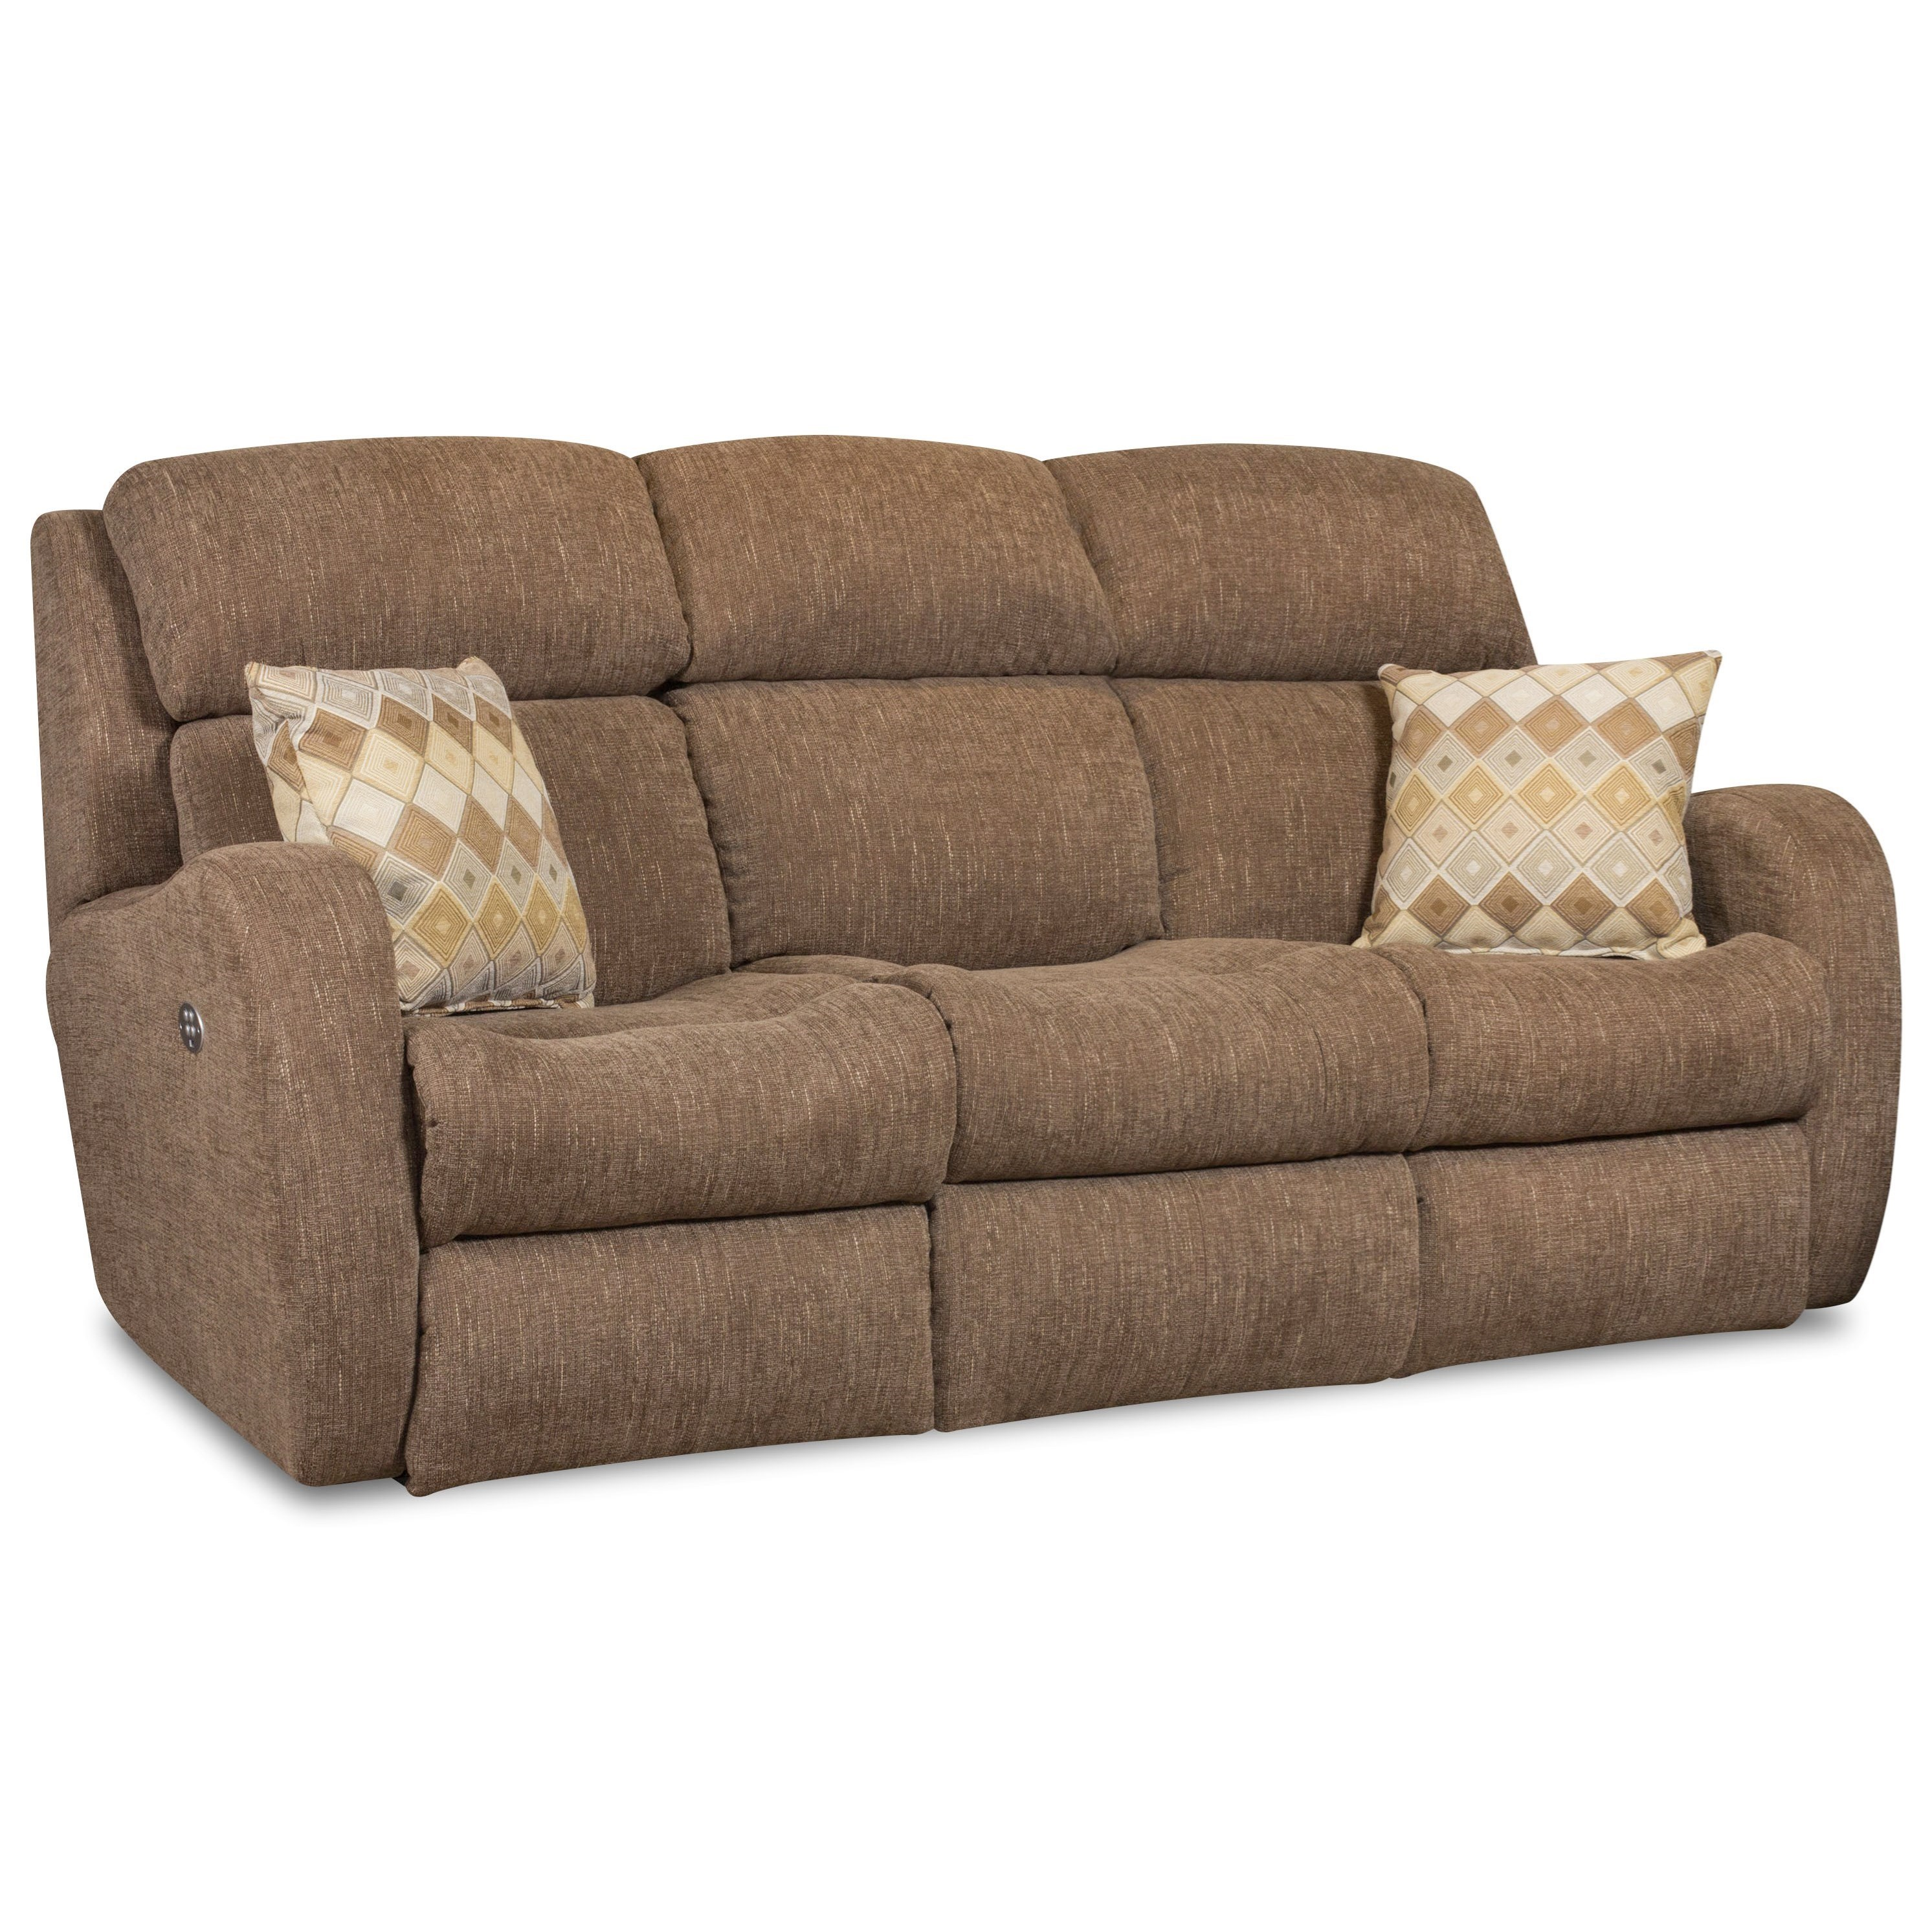 Southern Motion SiriReclining Sofa W/ Power Headrests U0026 Pillows